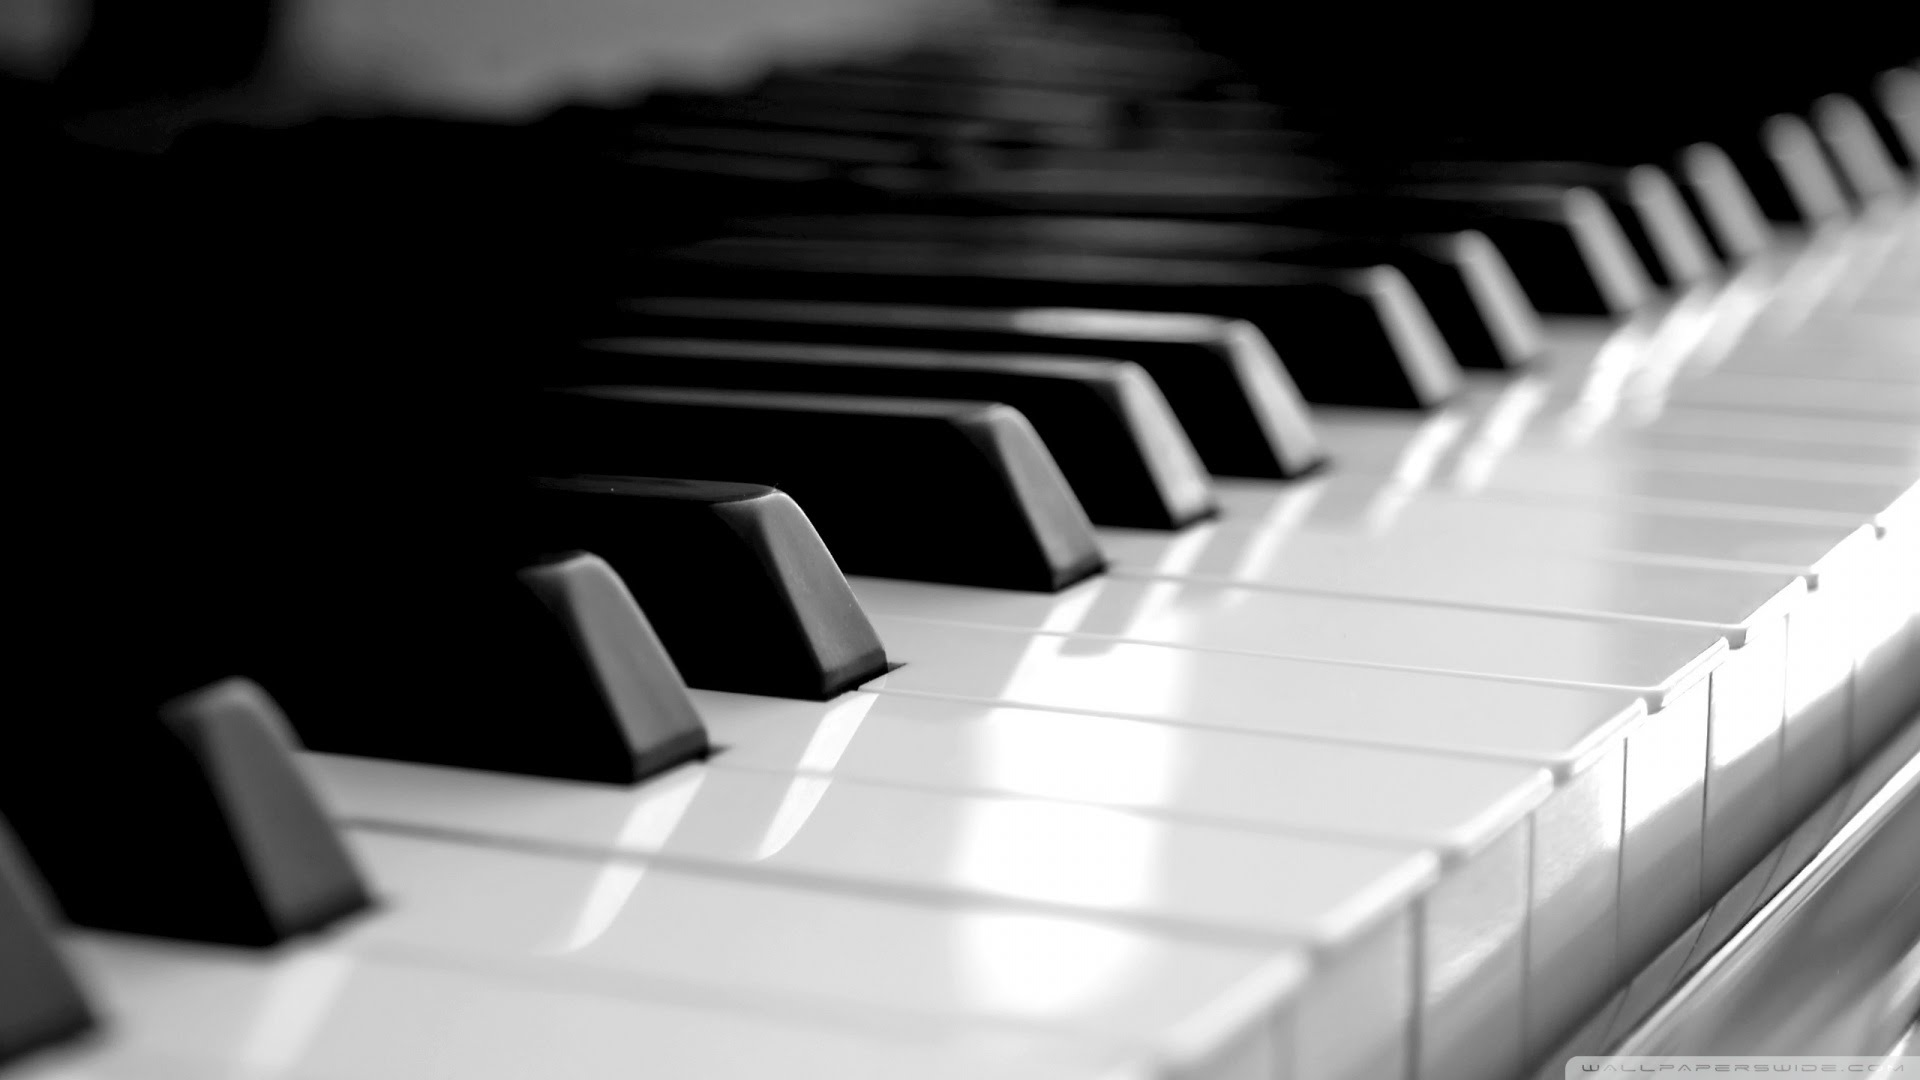 Poems Around The Piano